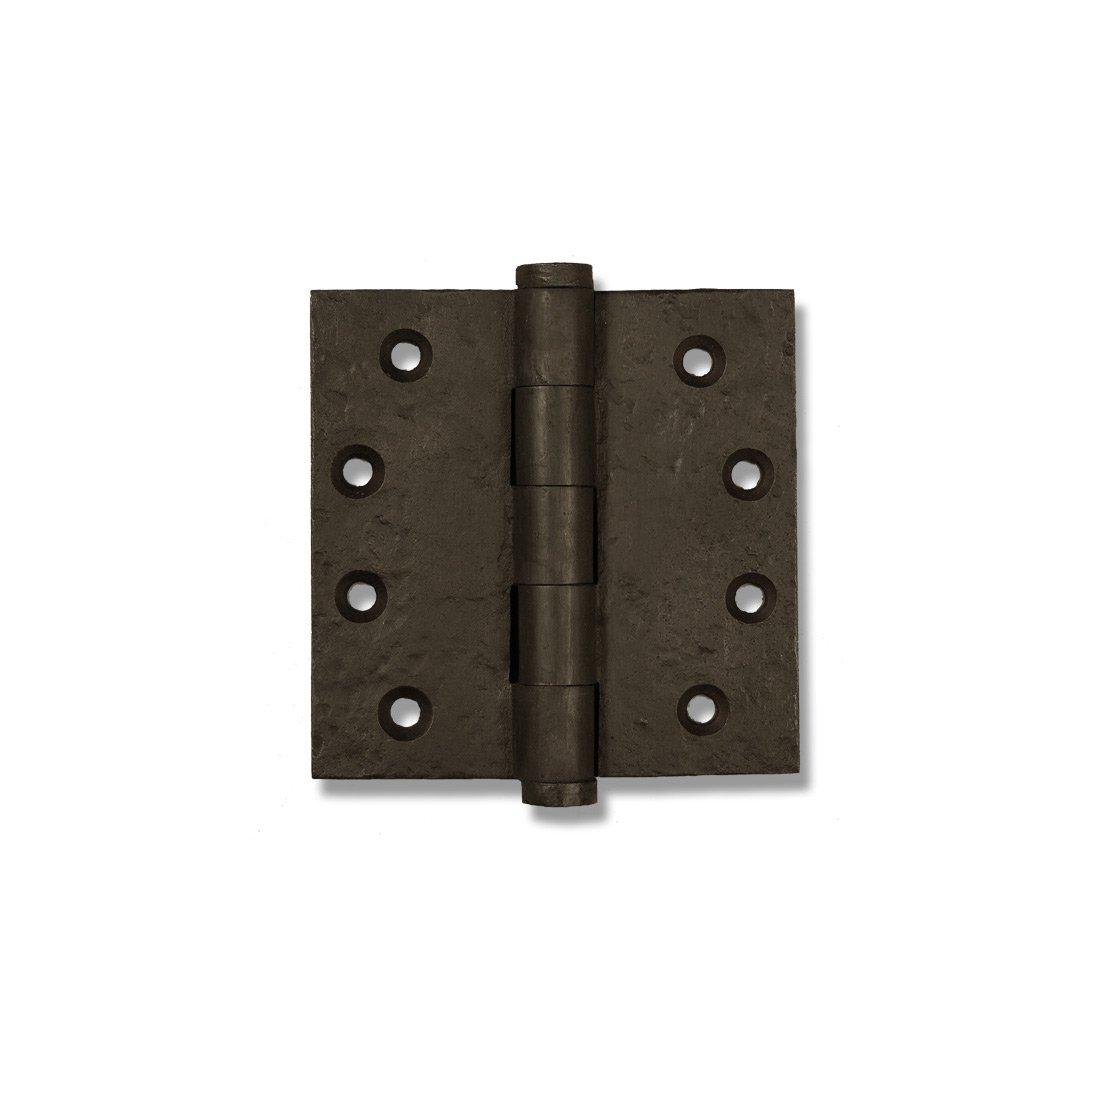 Coastal Bronze - 4''x4'' Heavy Duty Button Tip Hinge - 30-400